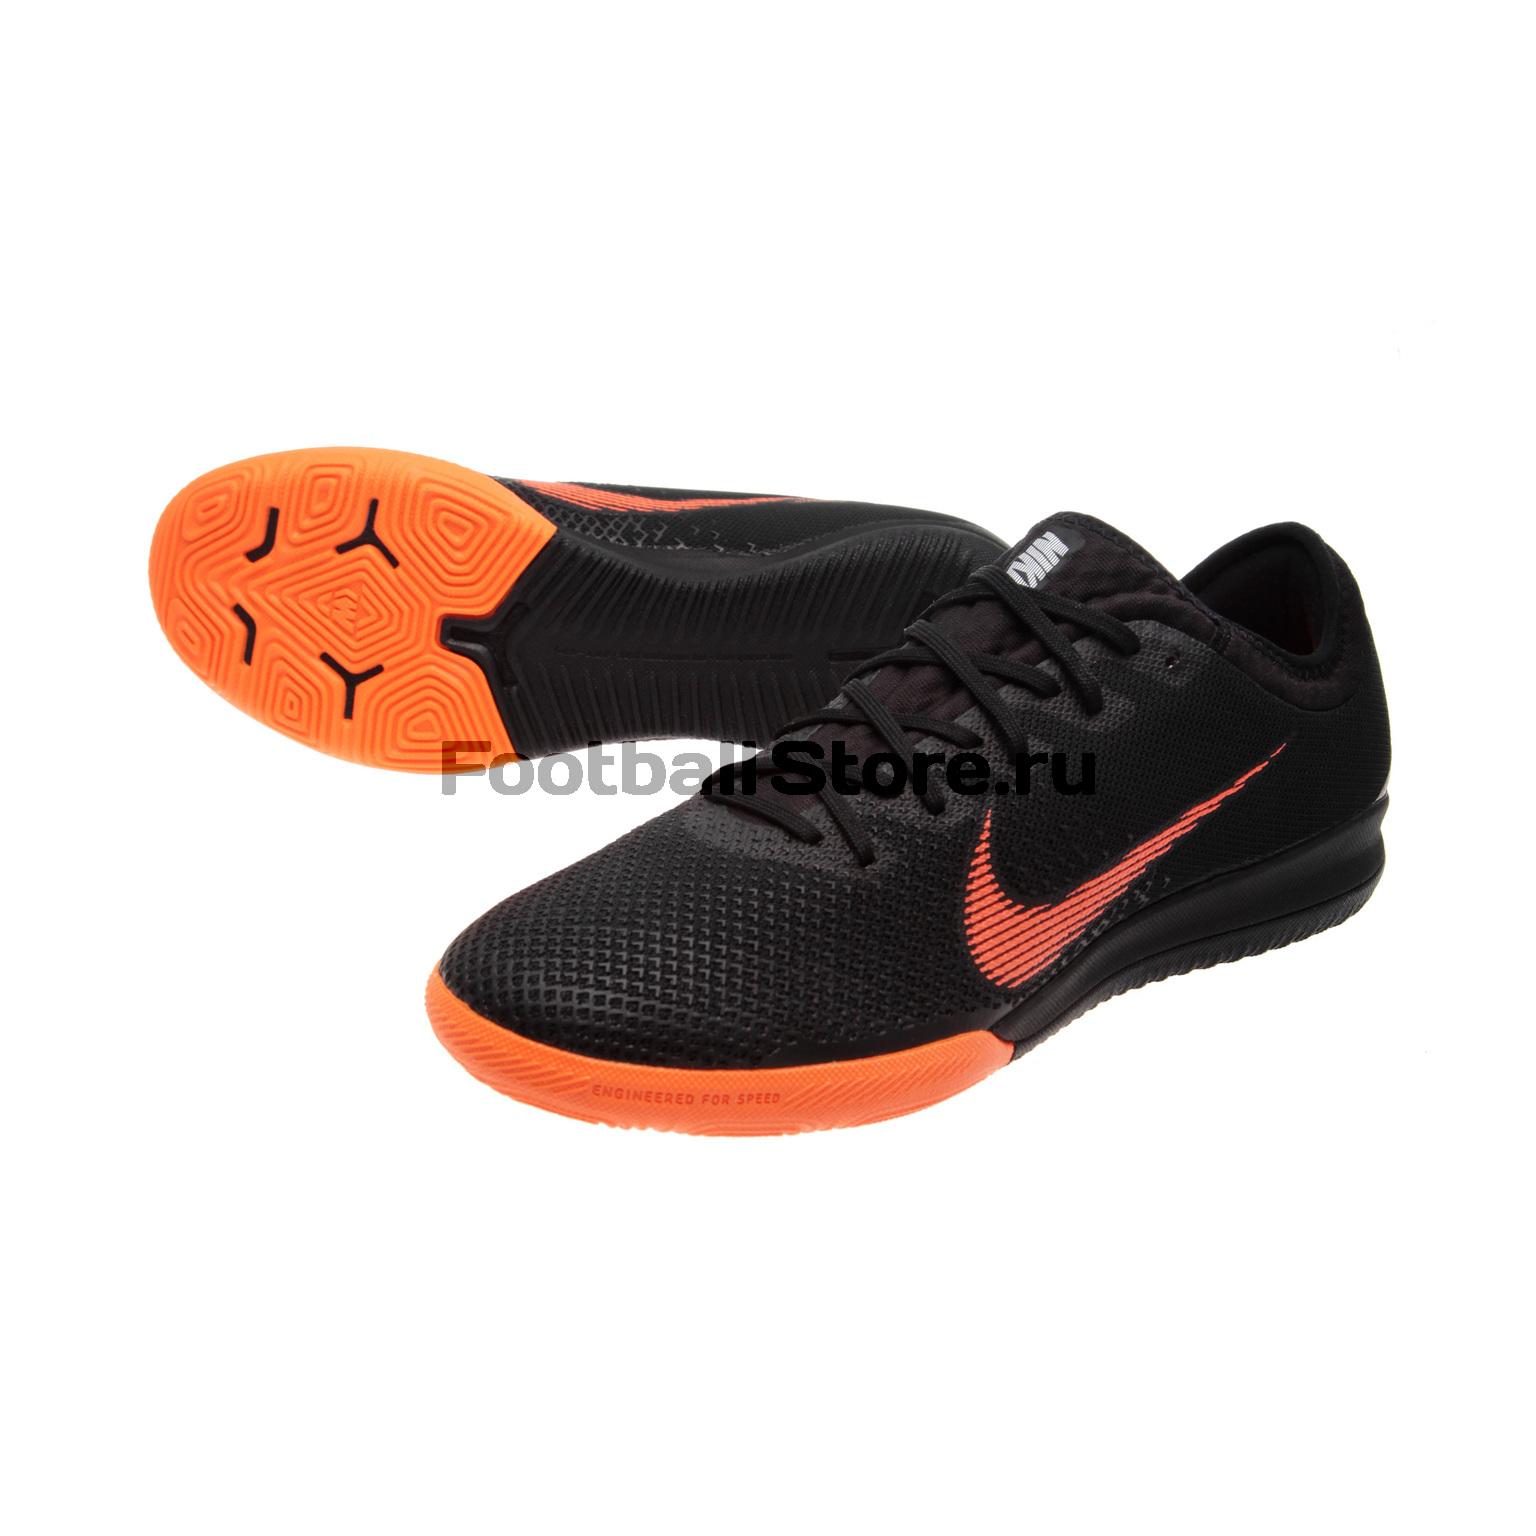 Обувь для зала Nike VaporX 12 Pro IC AH7387-081